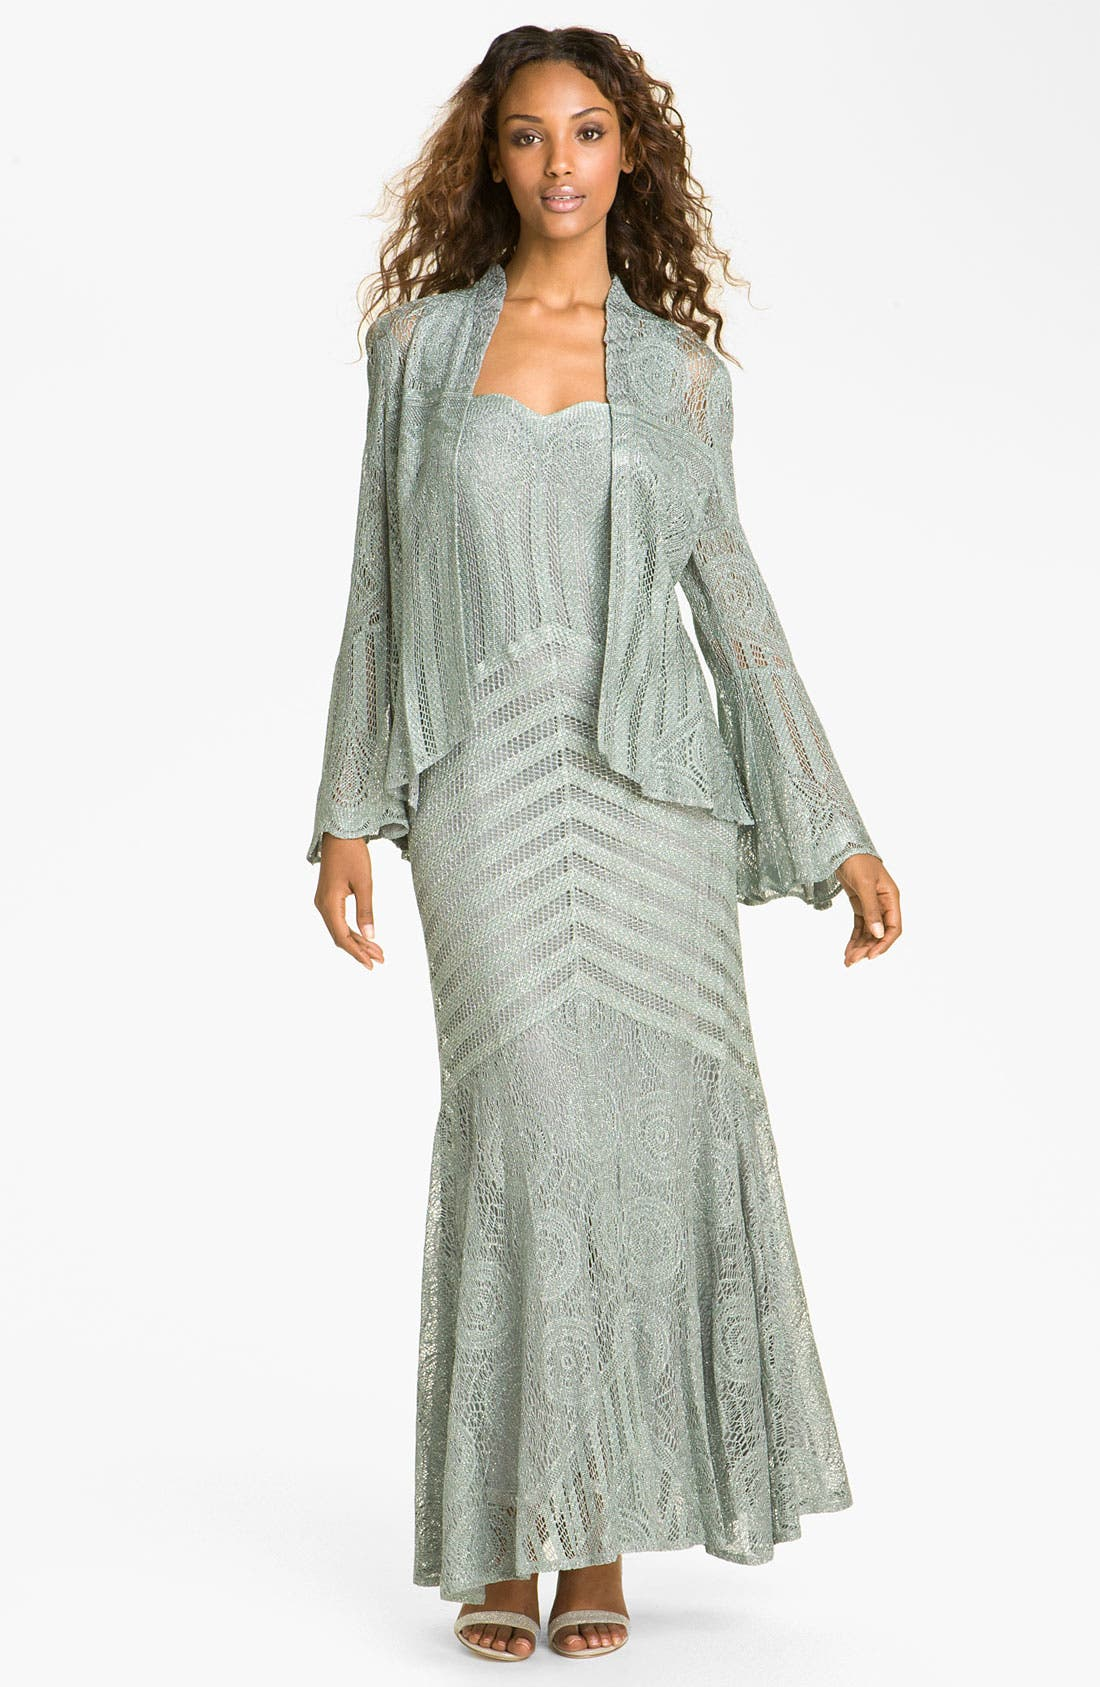 Main Image - Damianou 'Circles' Metallic Knit Gown & Jacket